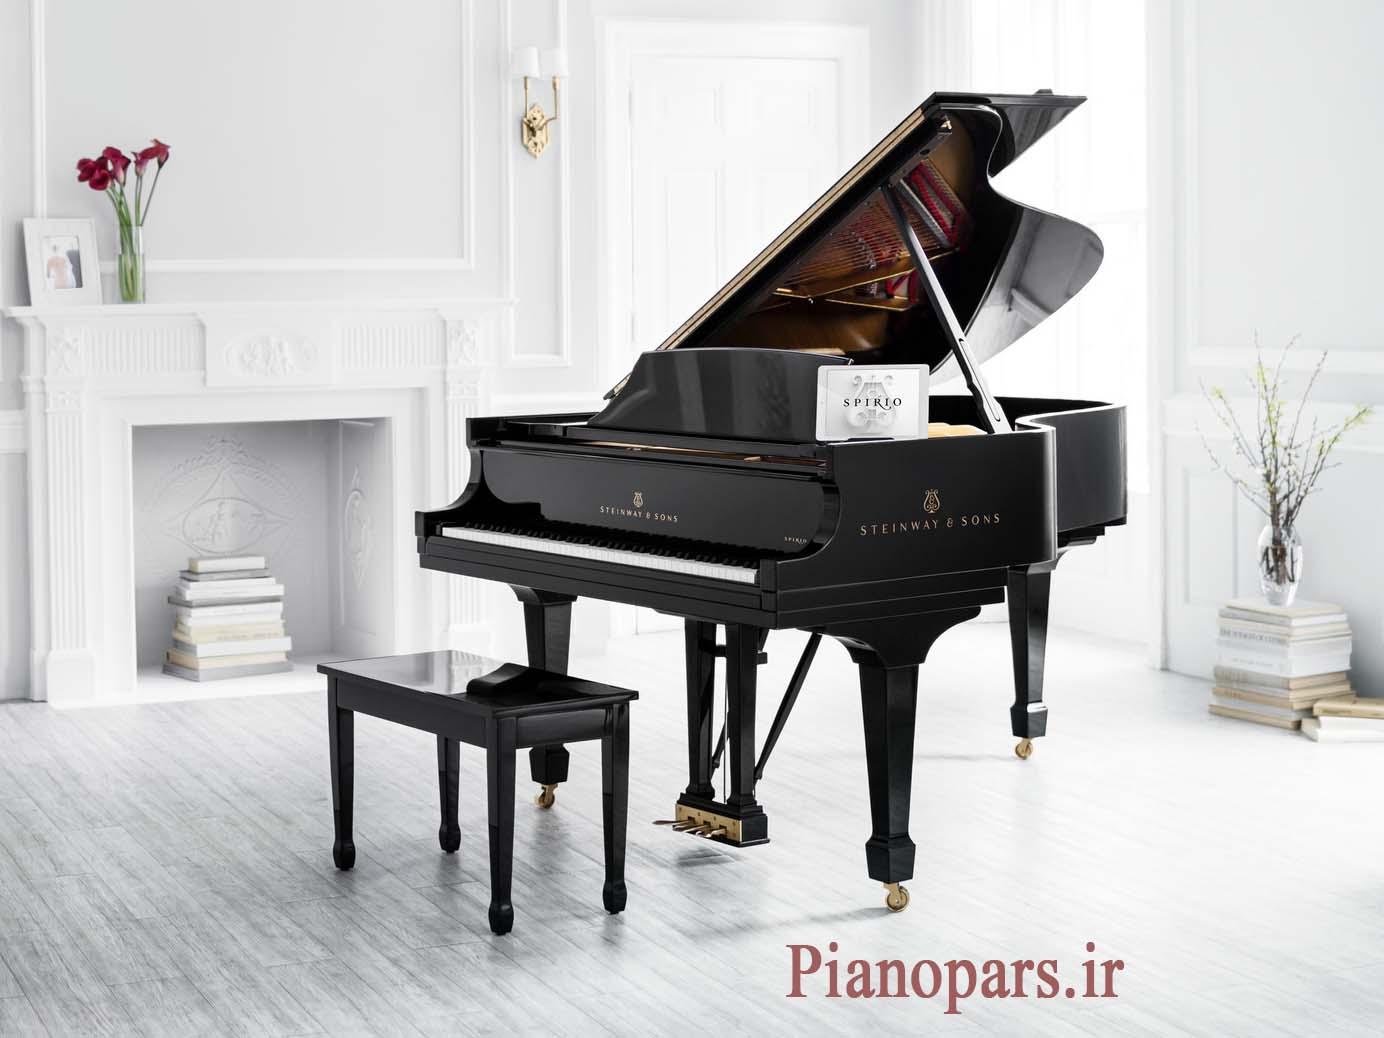 پیانو دیجیتال یاماها pianopars